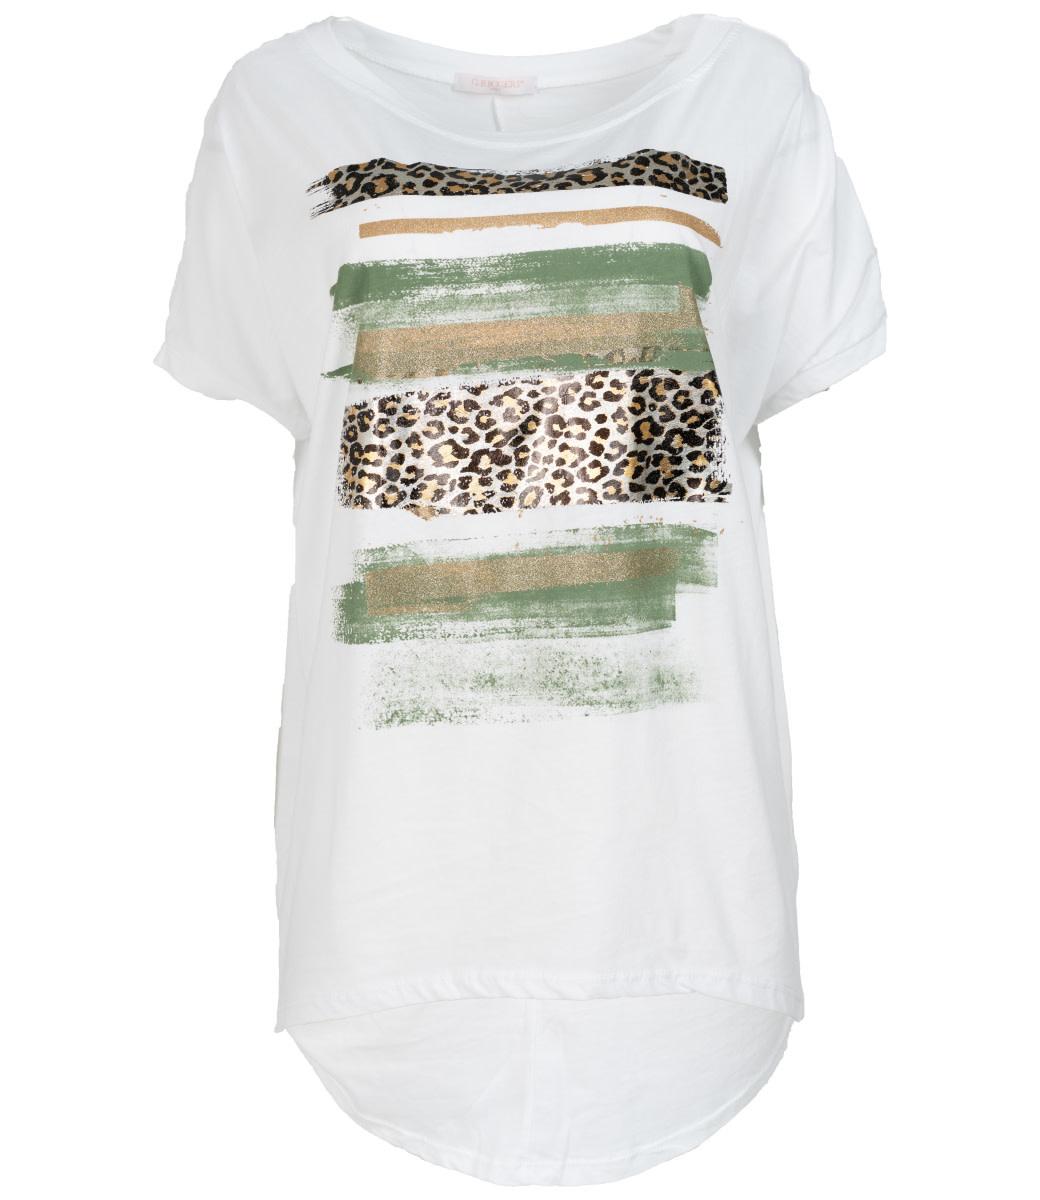 Gemma Ricceri Shirt wit/groen Chloe